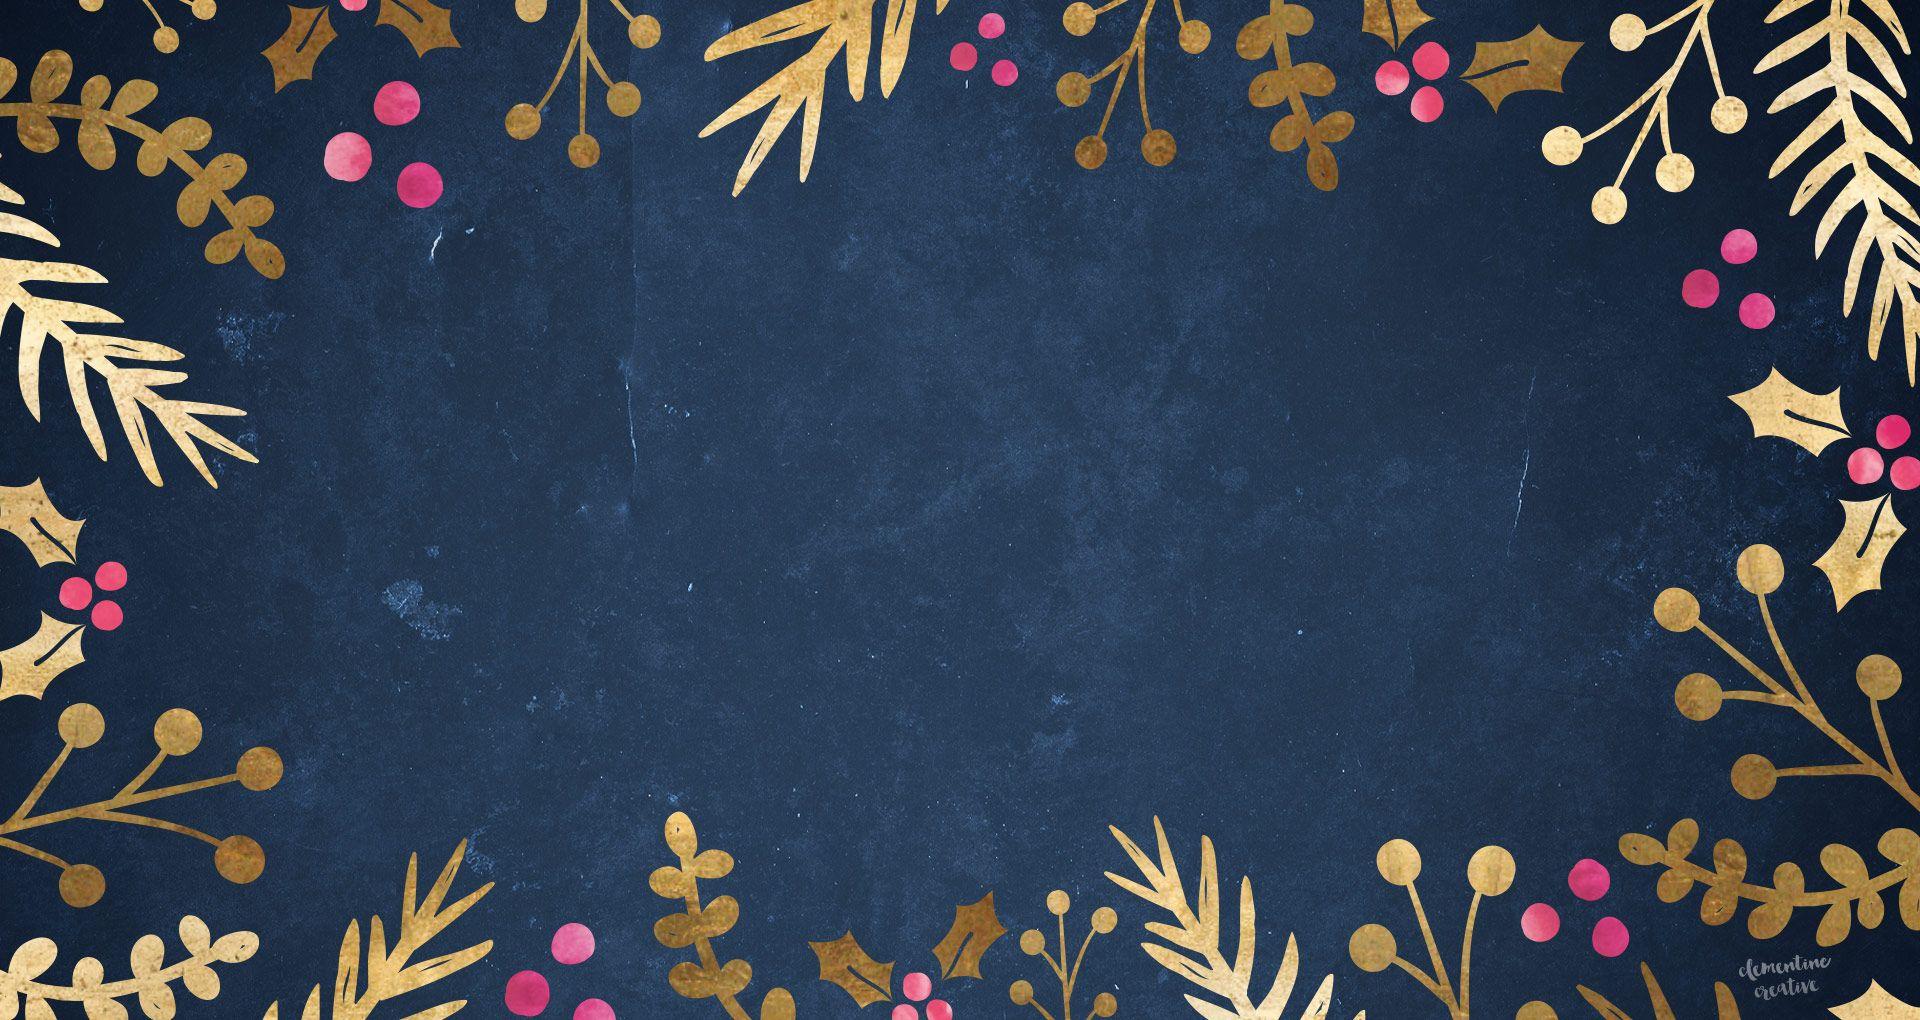 Free Cute Ipad Wallpapers Free Festive Wallpaper Gold Foil Foliage Wallpaper